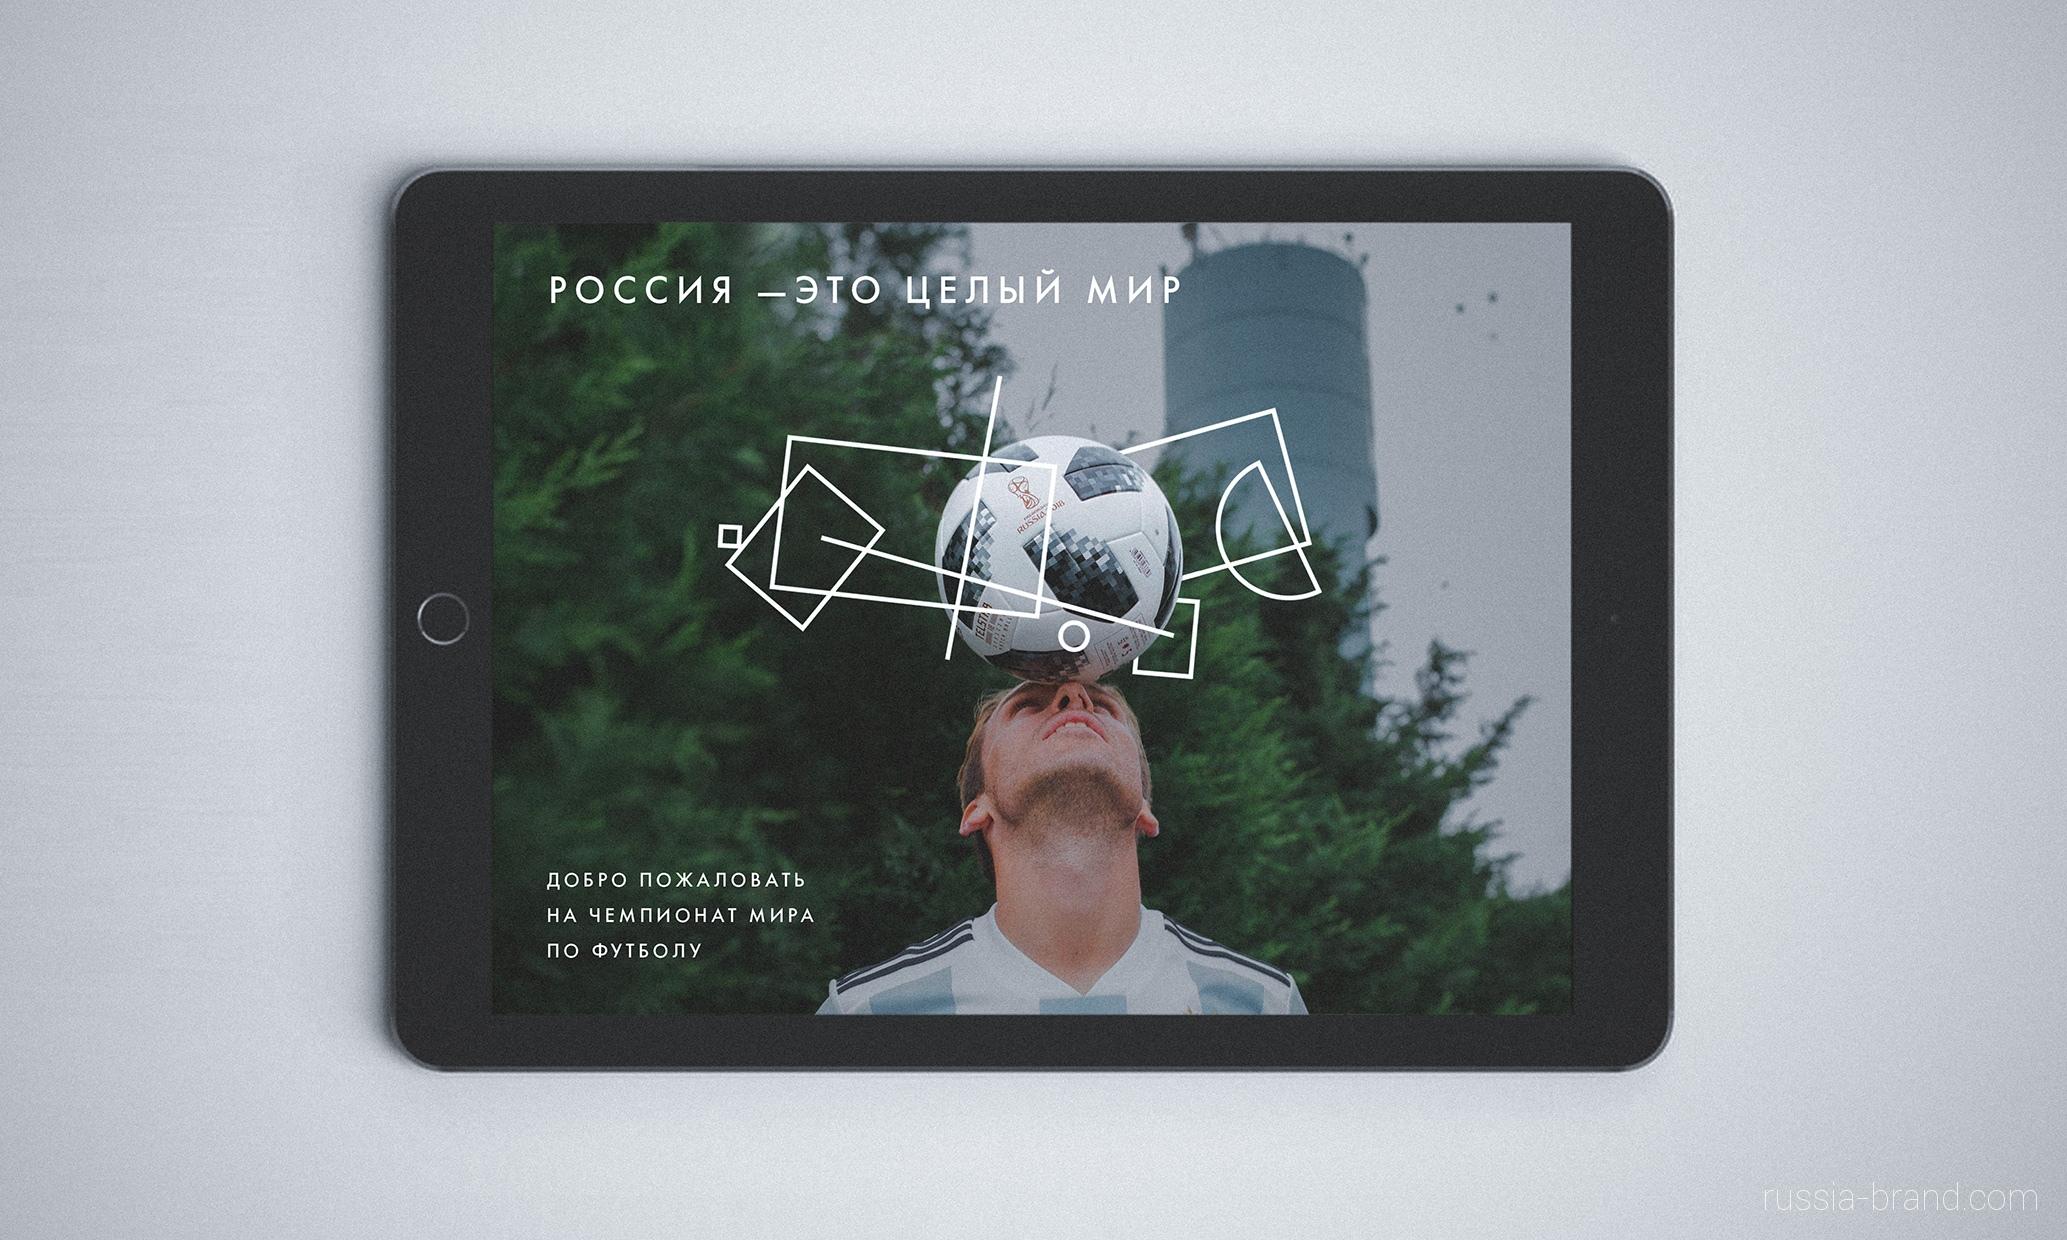 russia-brand-a95.jpg